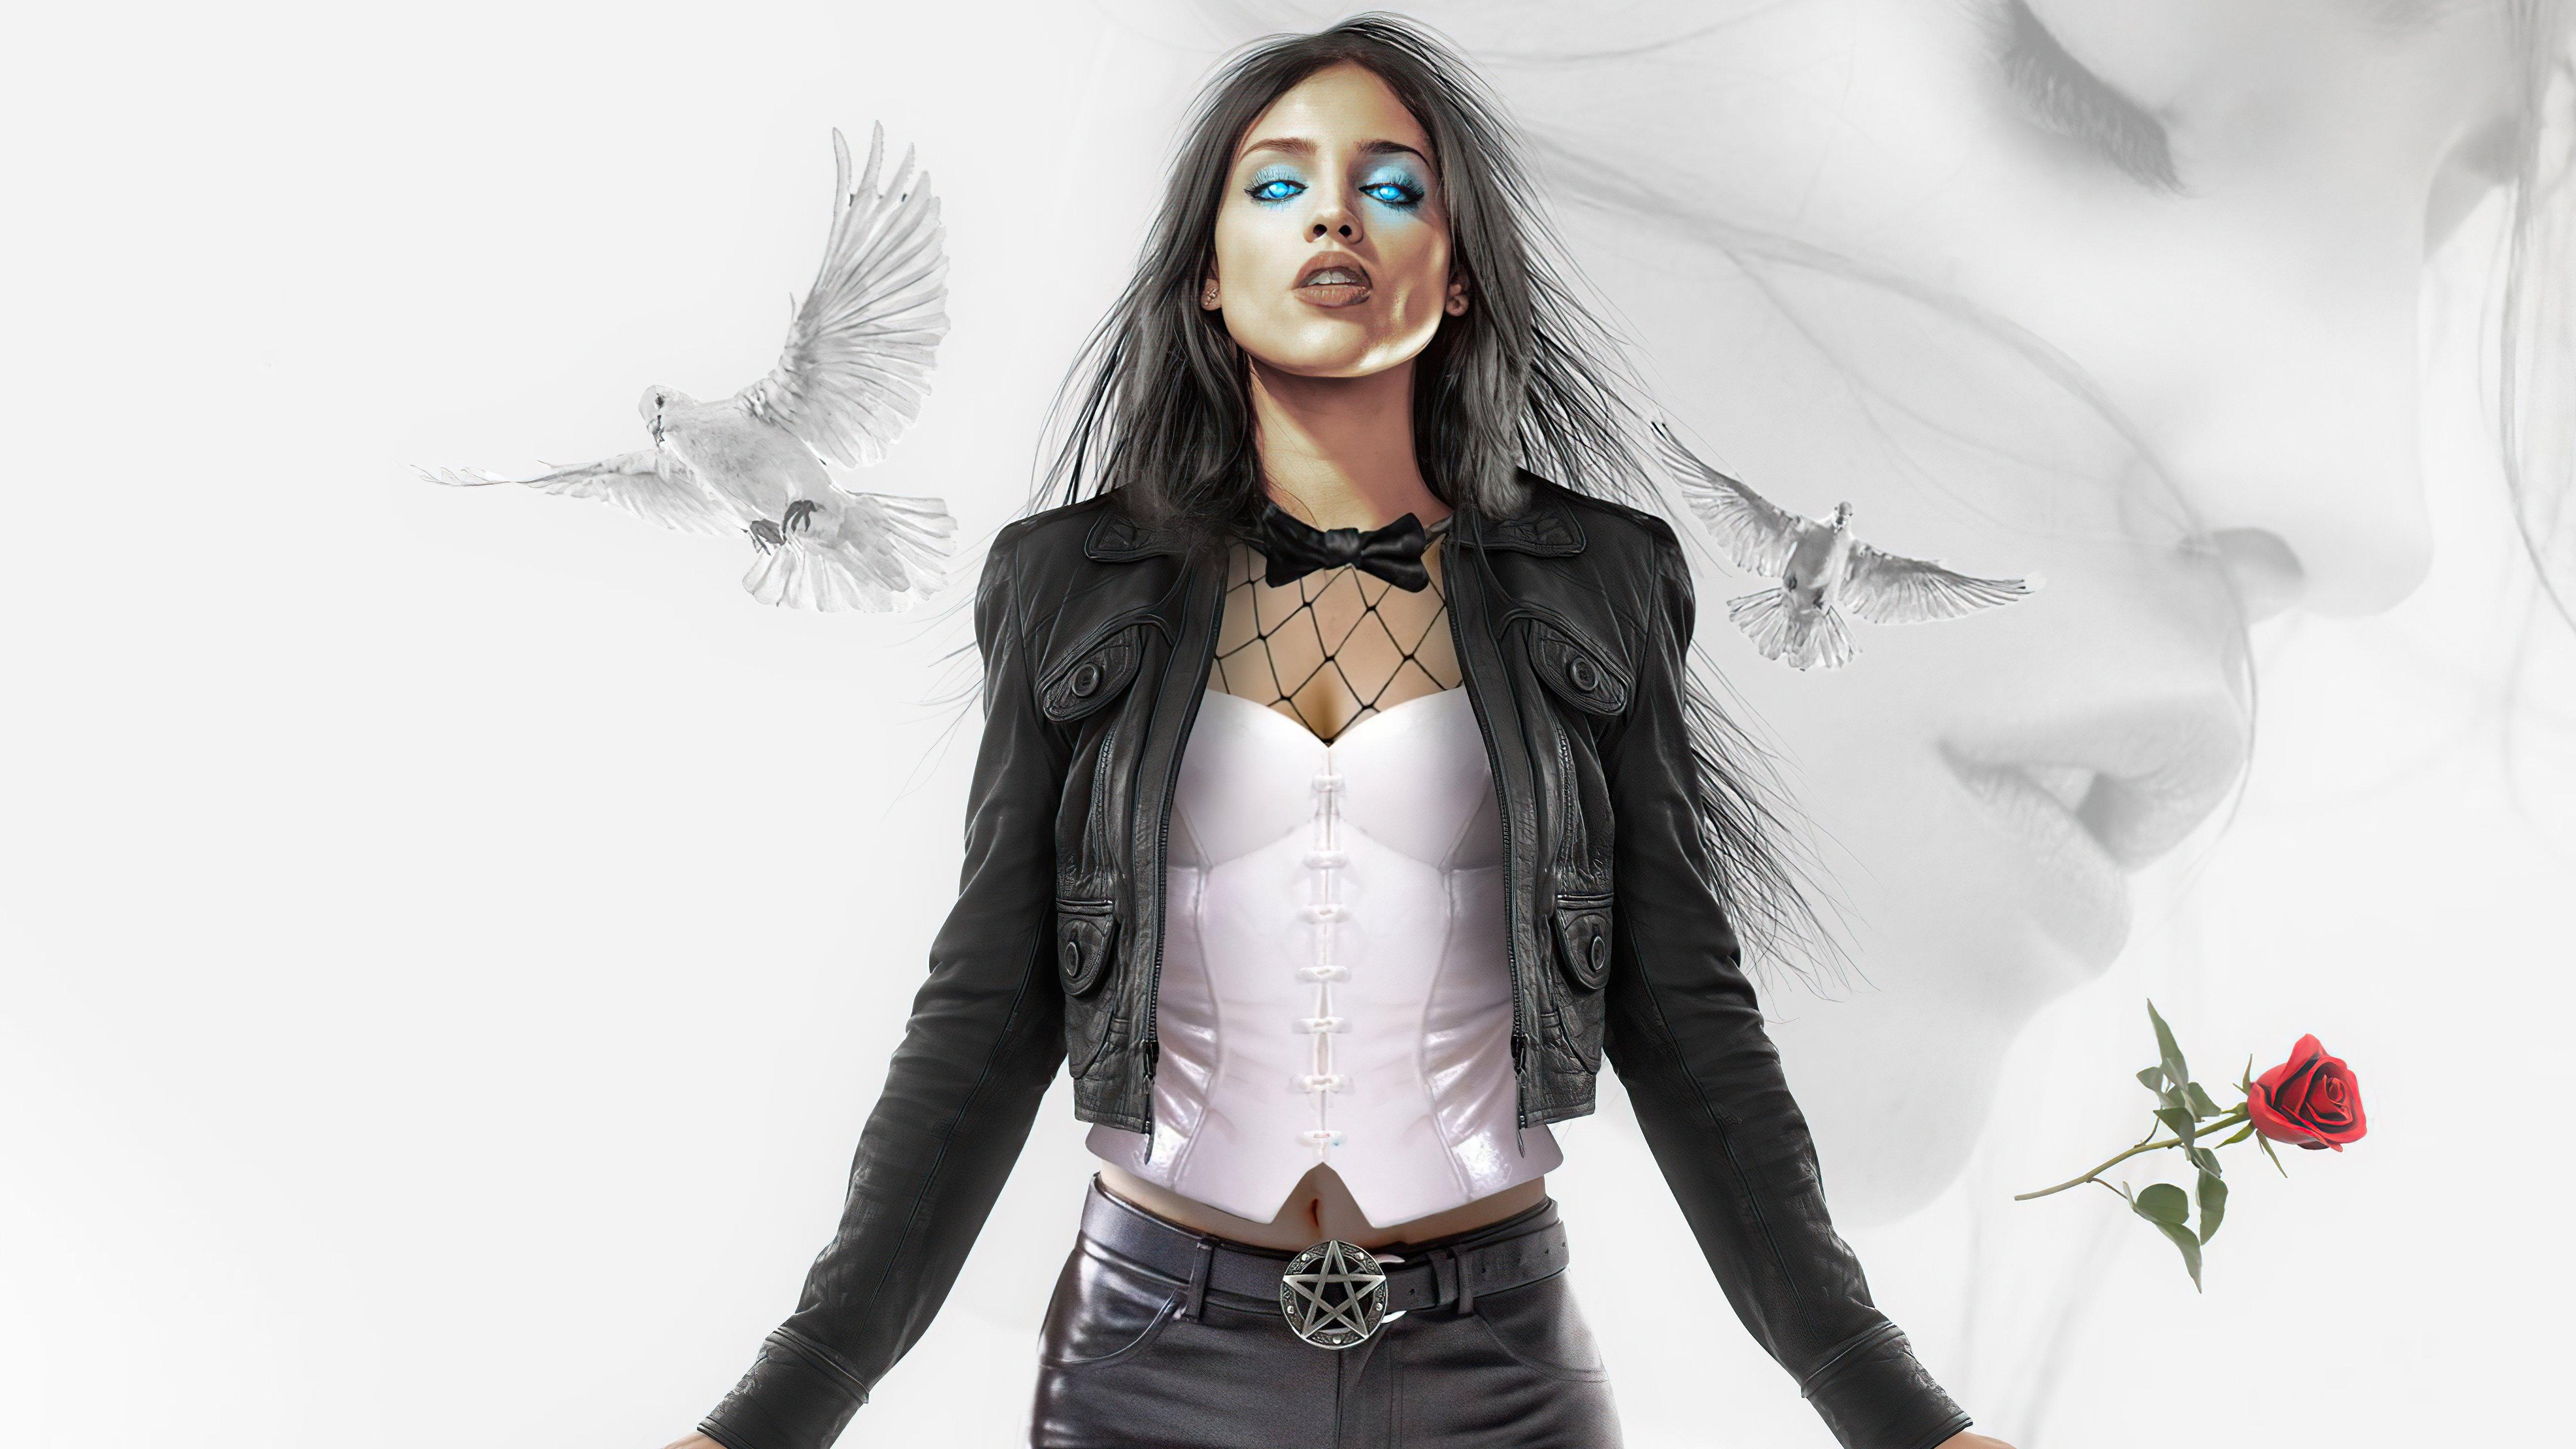 Wallpaper Eiza Gonzalez as Zatanna